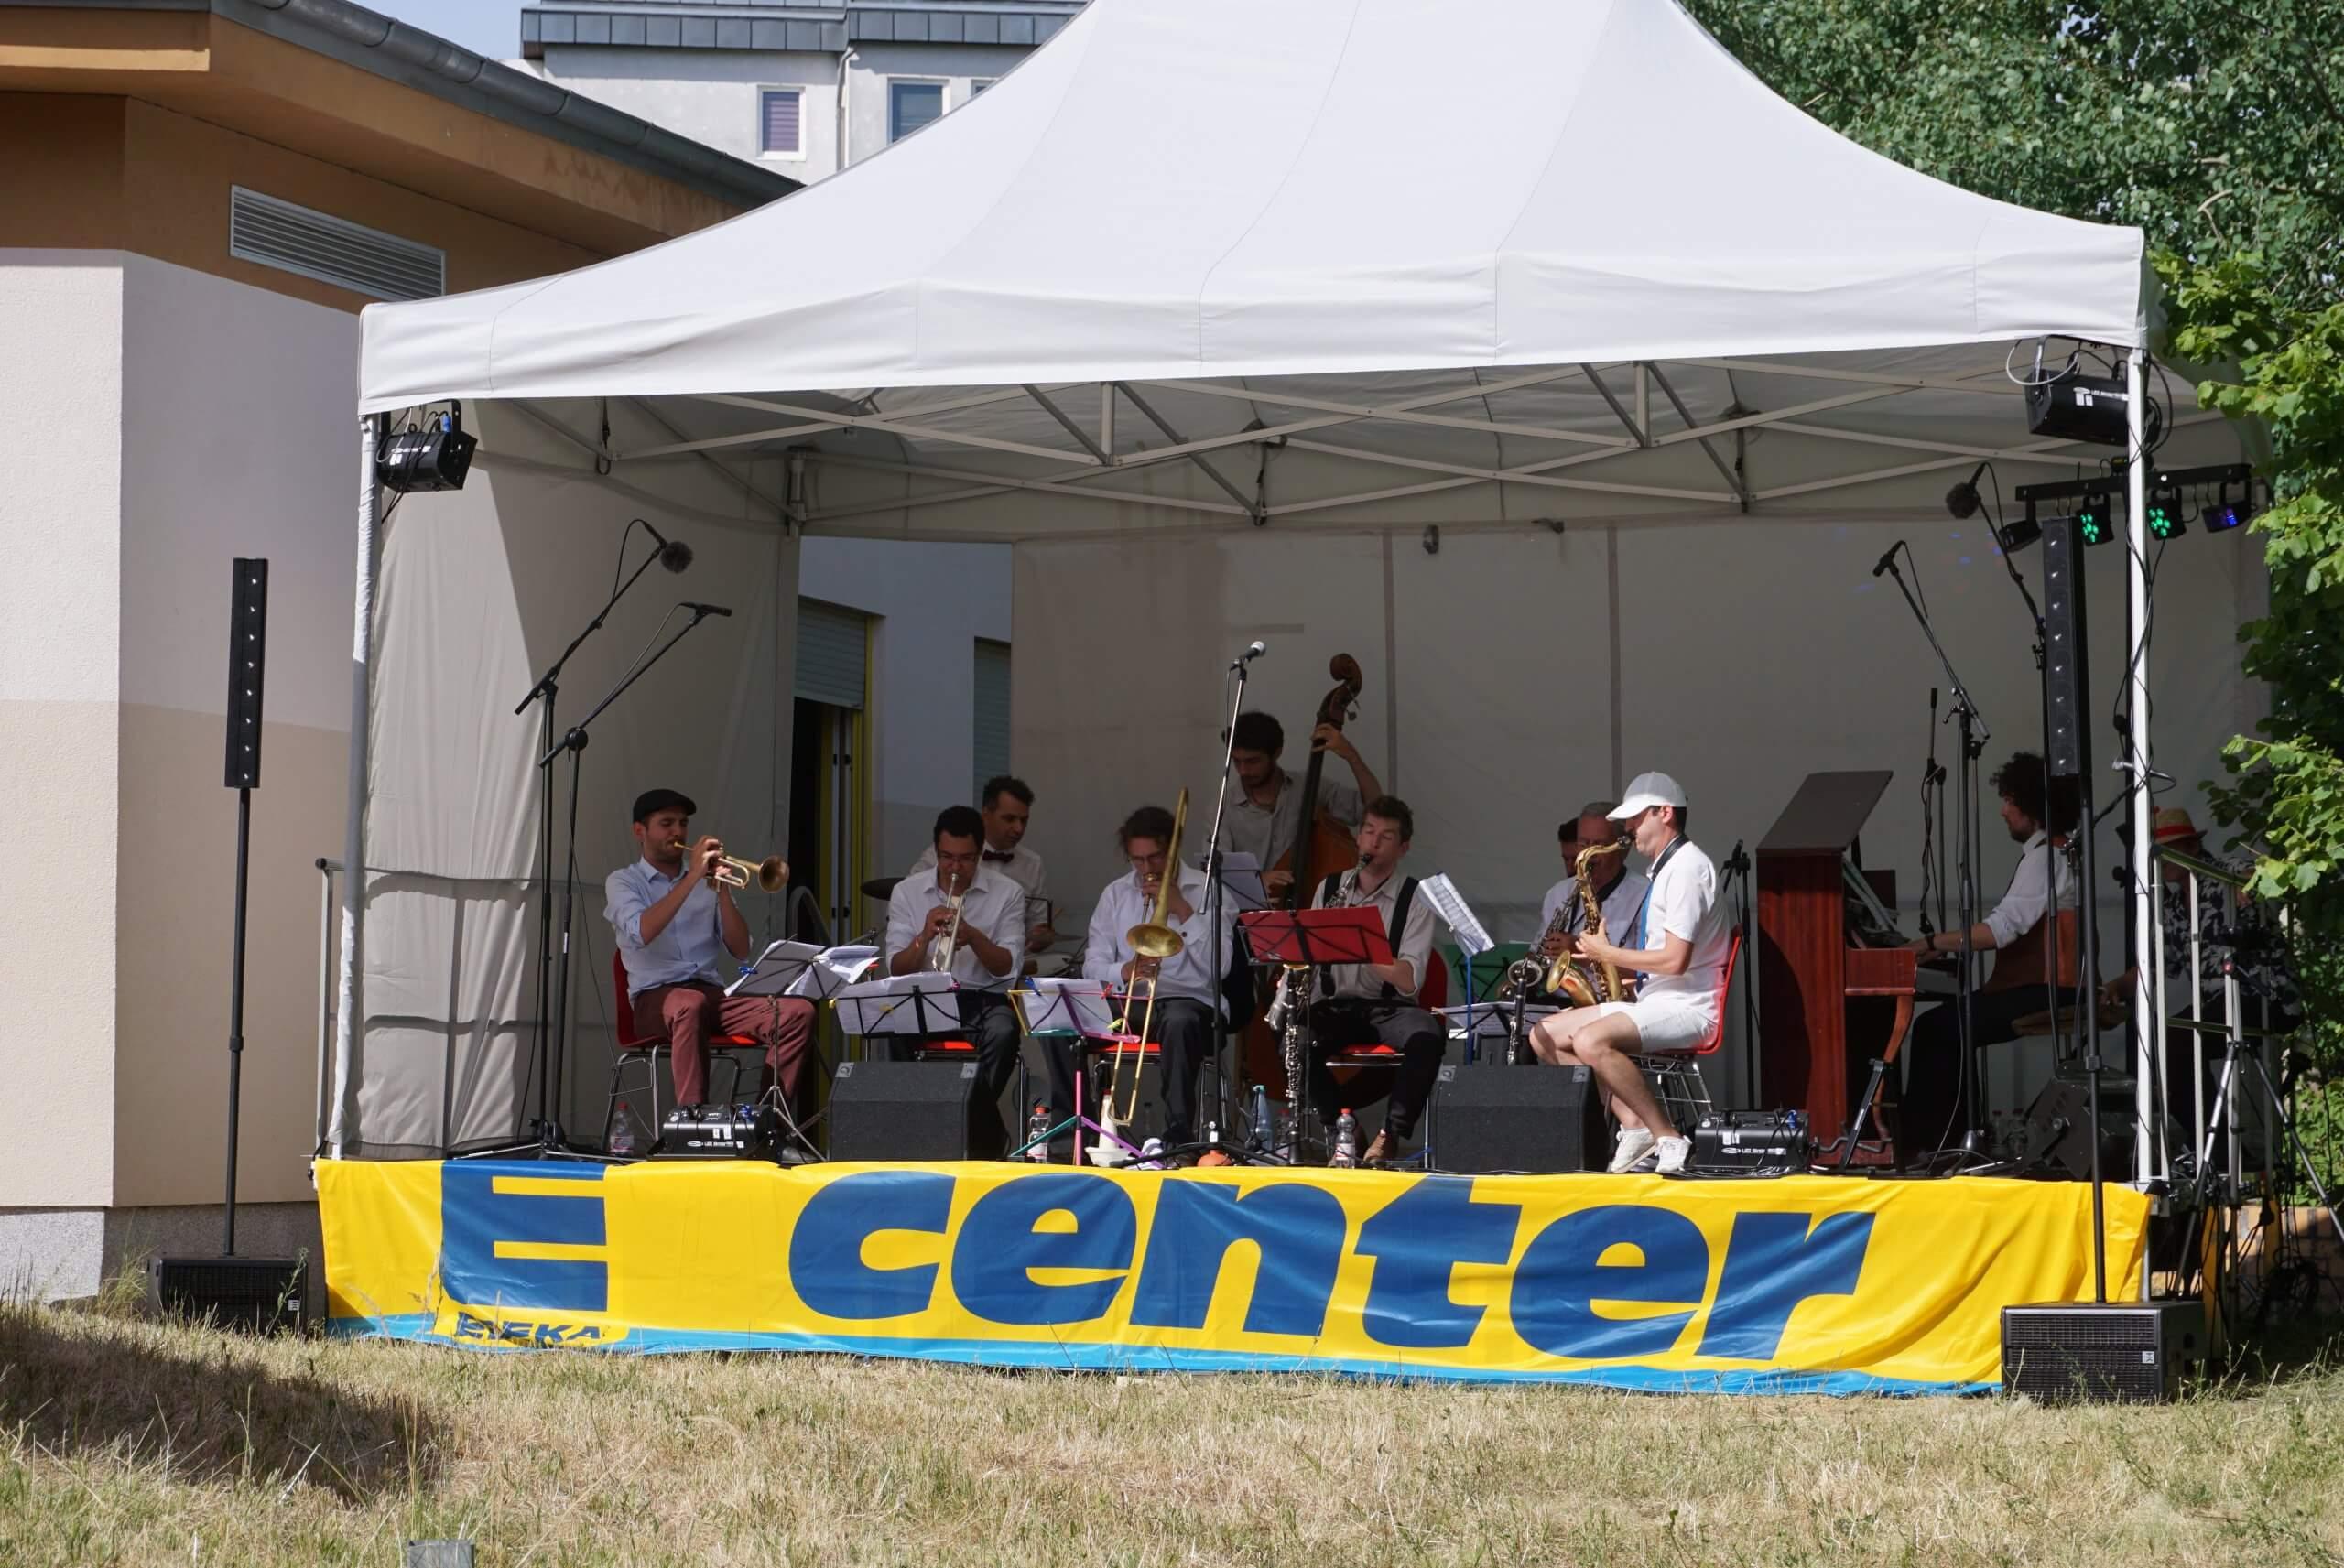 Auftritt des Syncopation Society Orchestra.